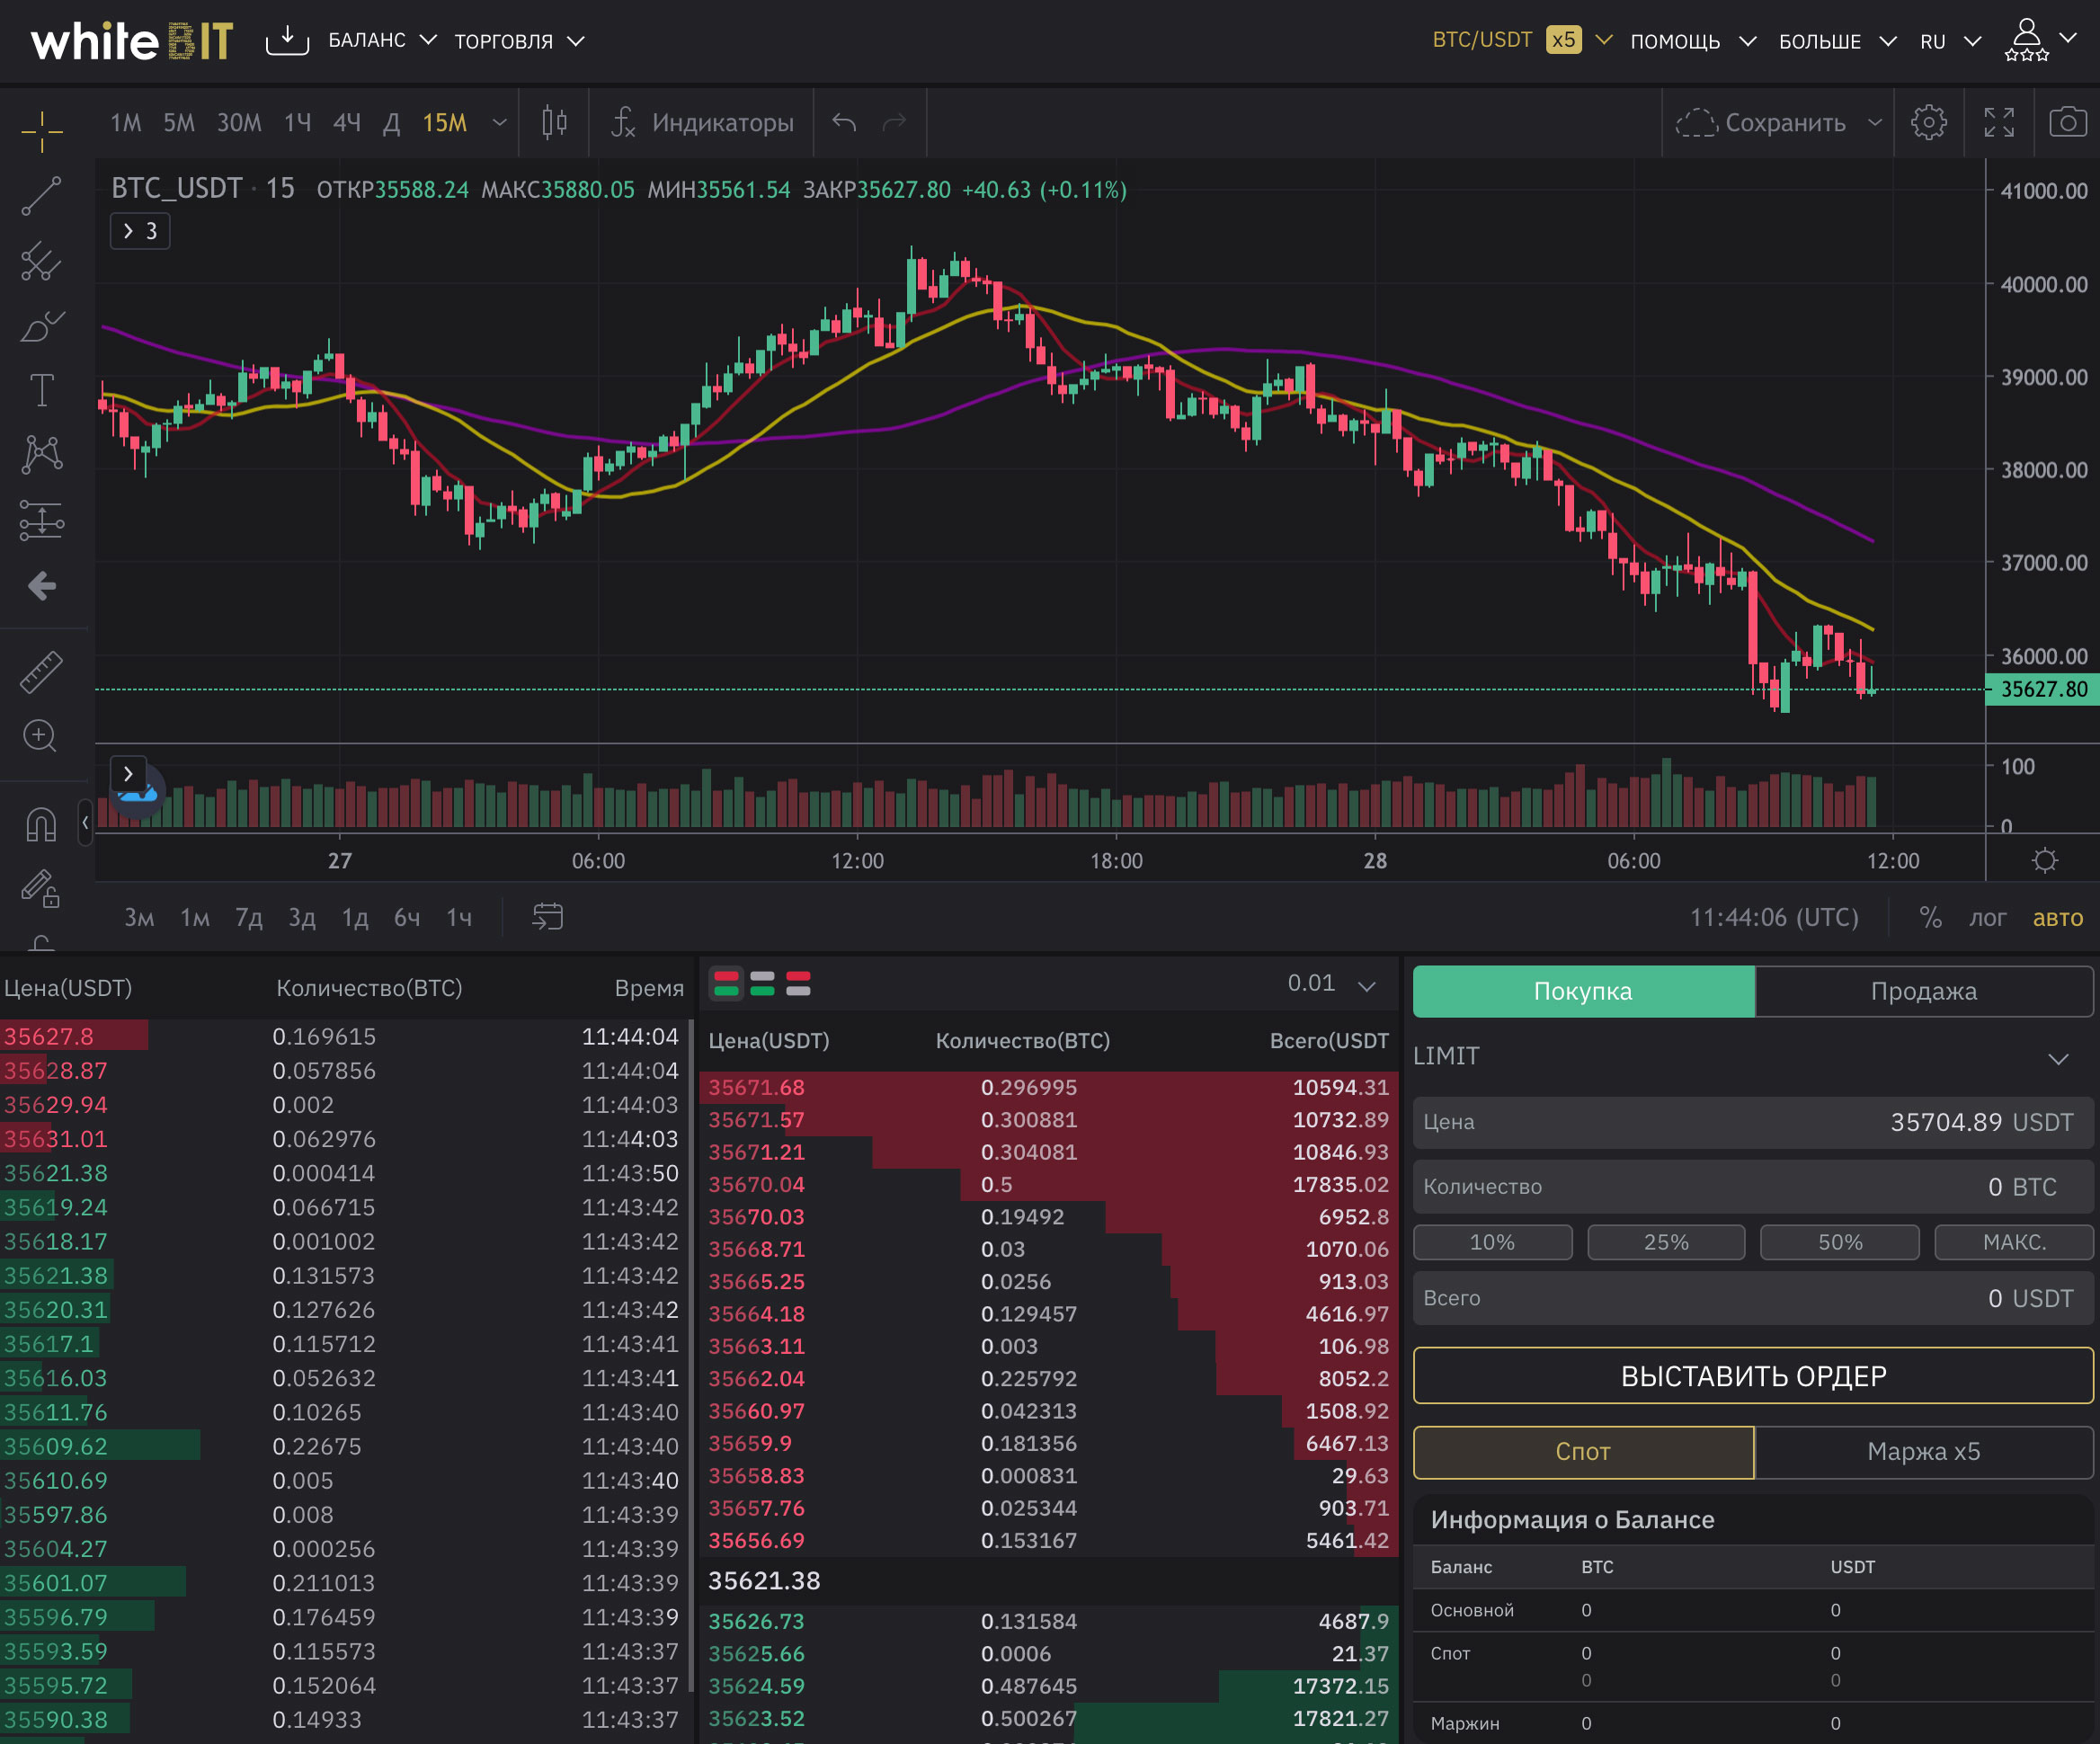 биржа криптовалют whitebit платформа интерфейс